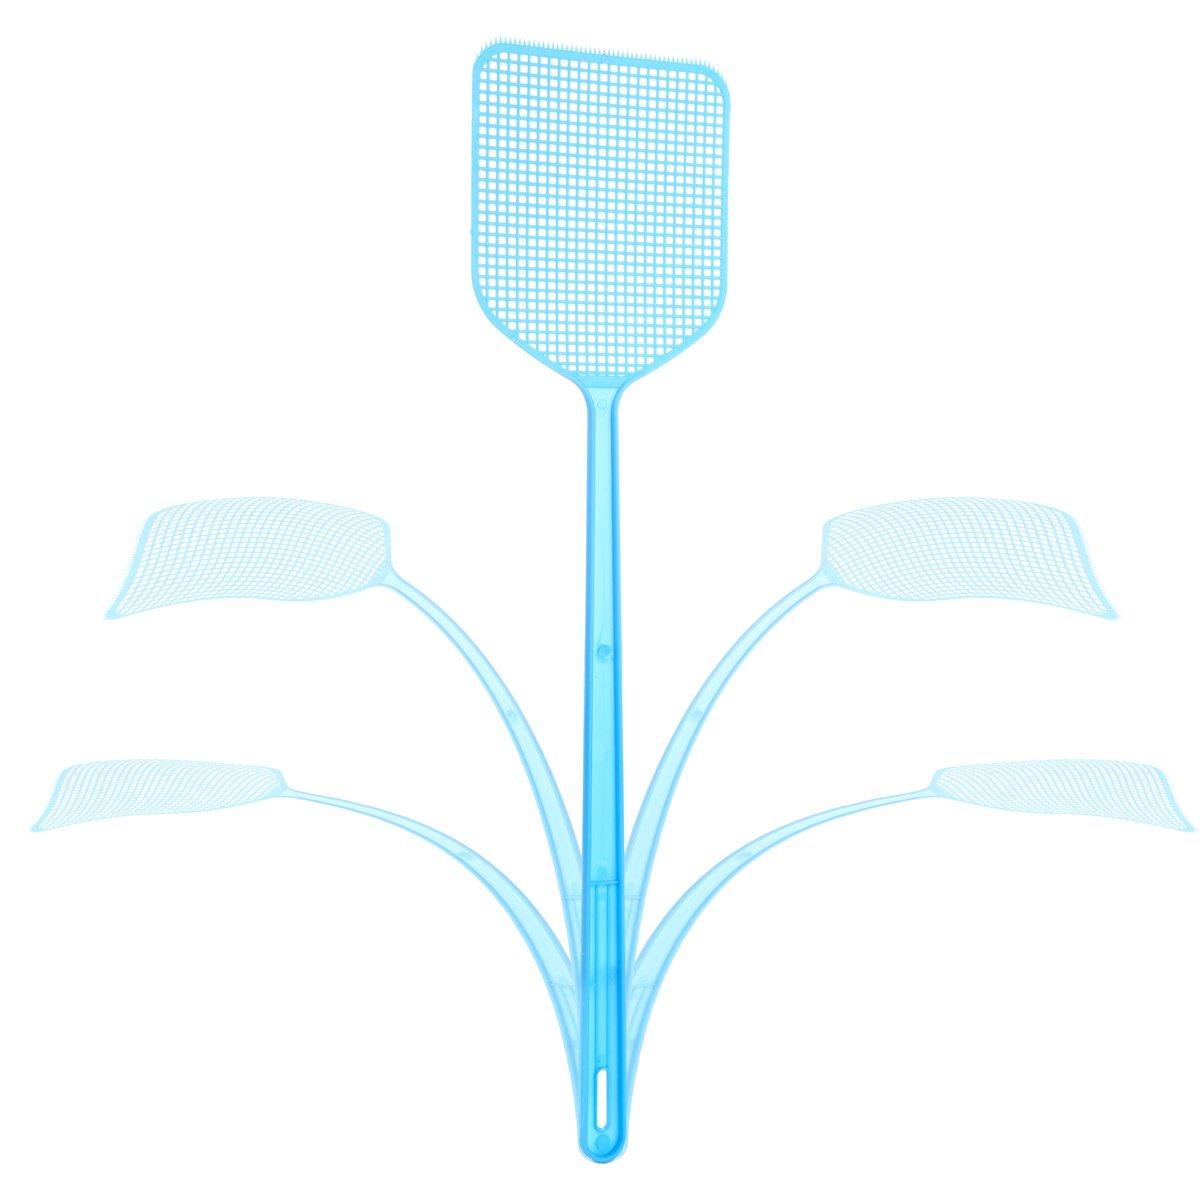 alpha-ene.co.jp 4 Pack NETCAT Fly Swatter Manual Swat Pest Control ...